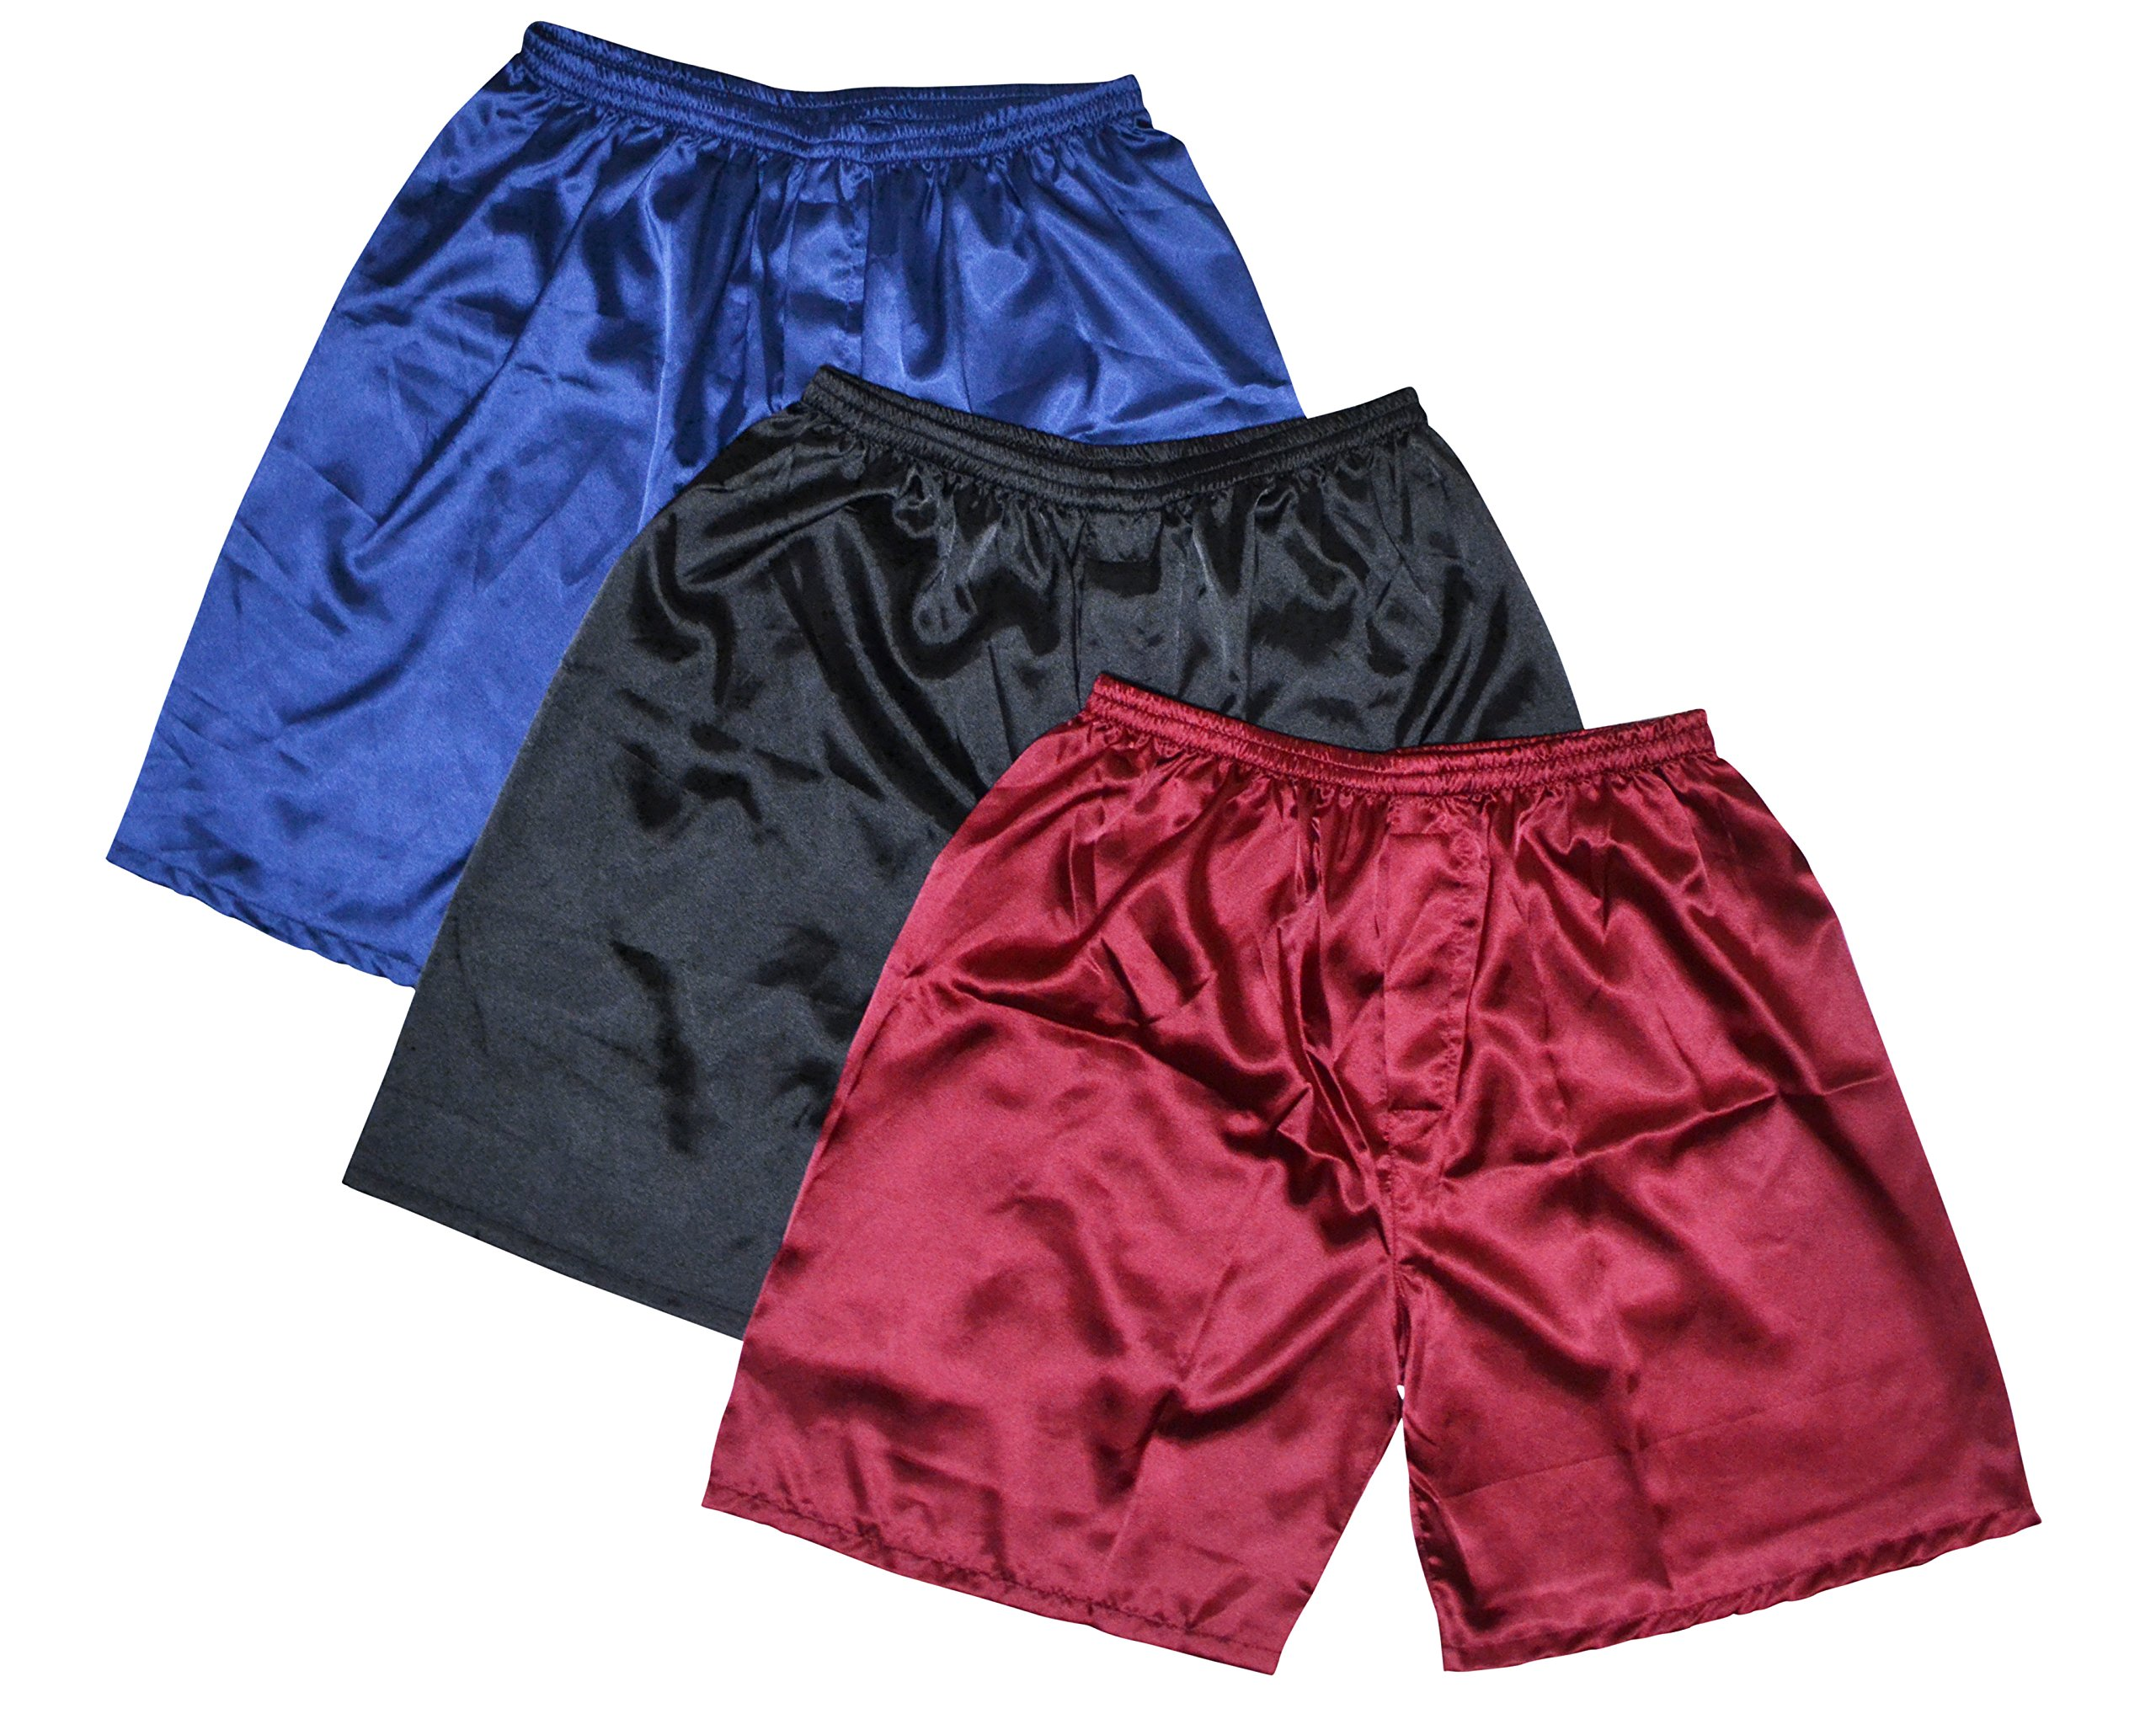 TONY & CANDICE Men's Satin Boxers Shorts Combo Pack Underwear, (3-Pack) (L)